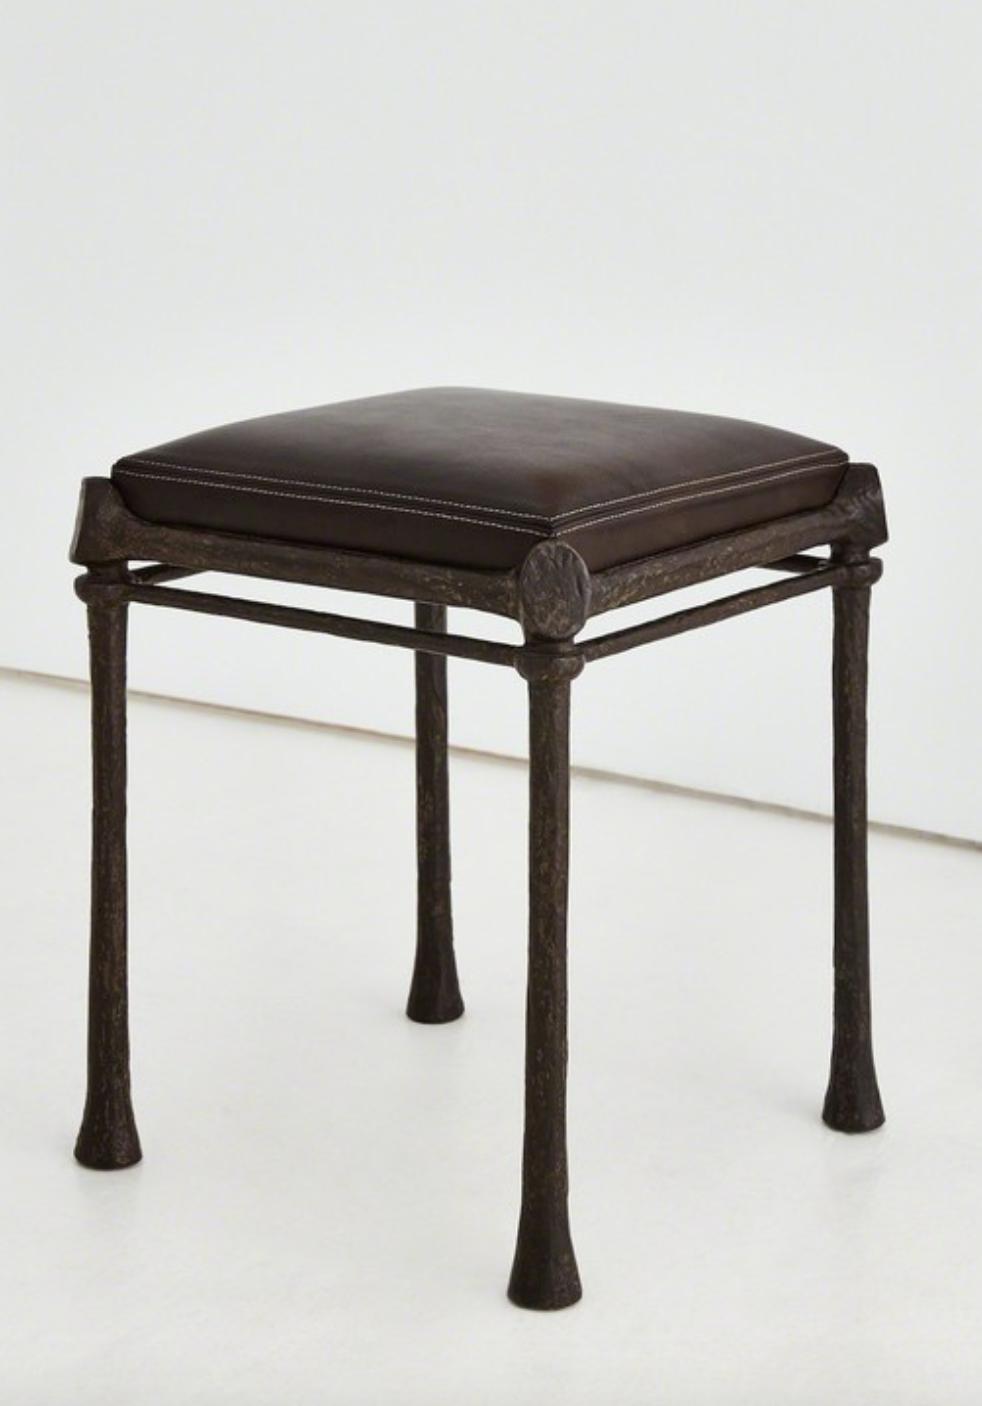 Philippe Anthonioz Furniture Upholstery Bench Furniture Interior Furniture